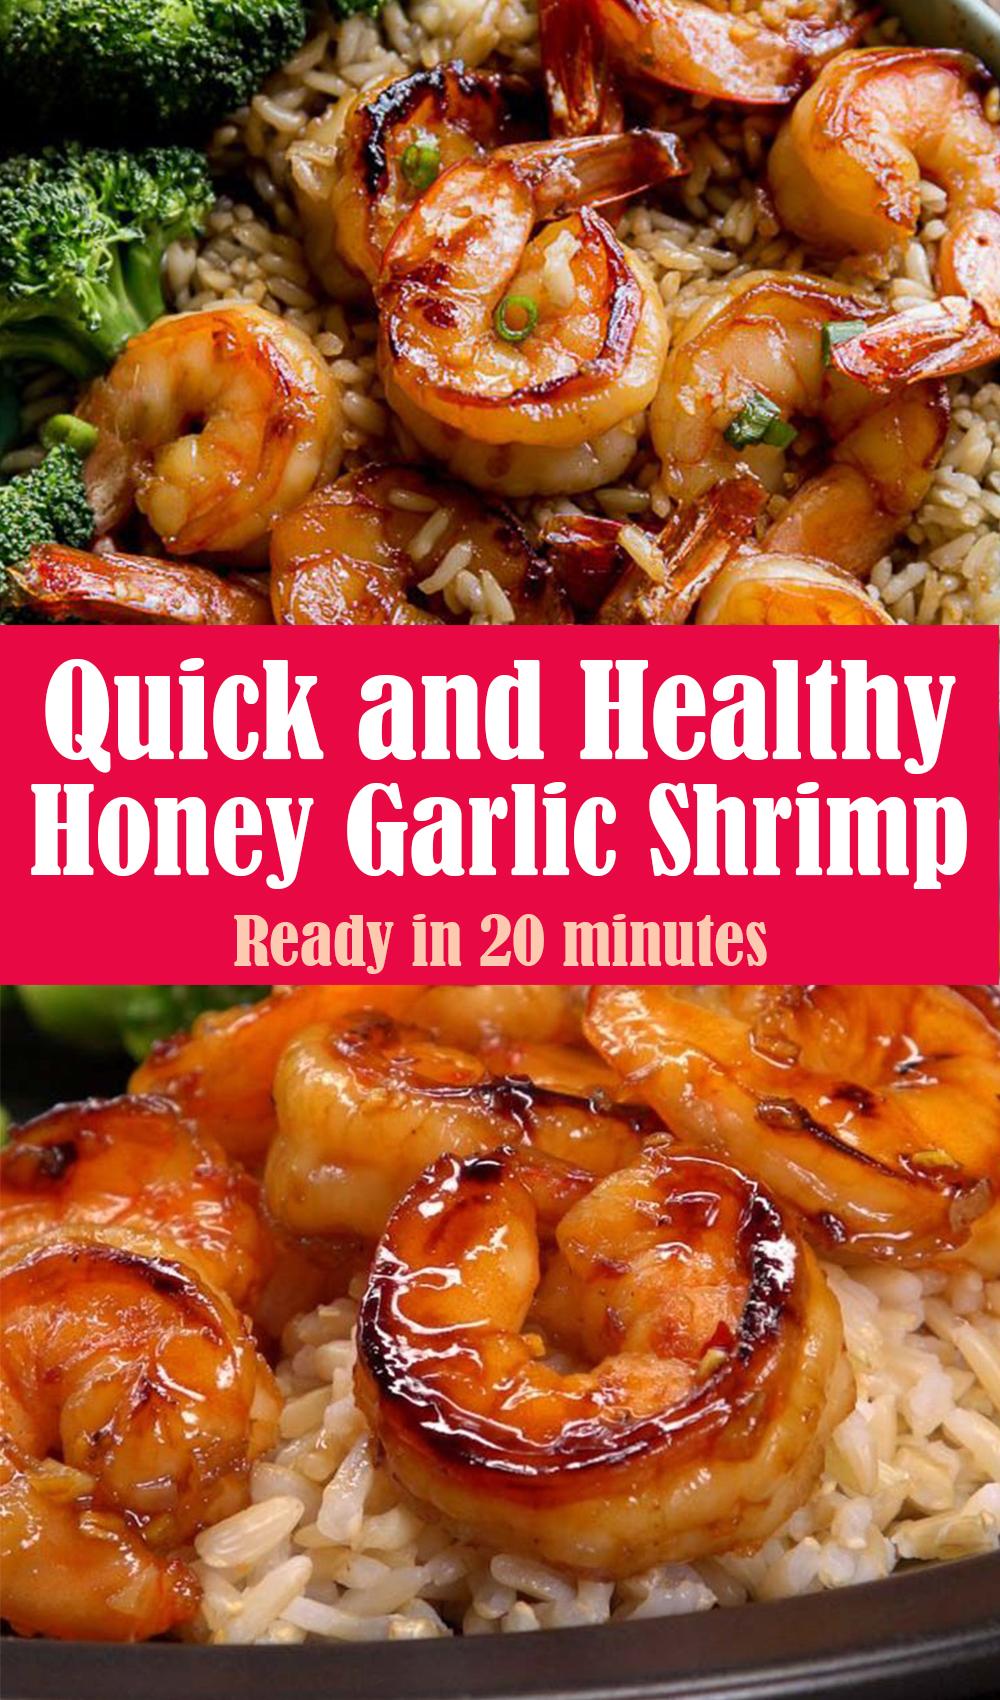 Quick and Healthy Honey Garlic Shrimp Recipe